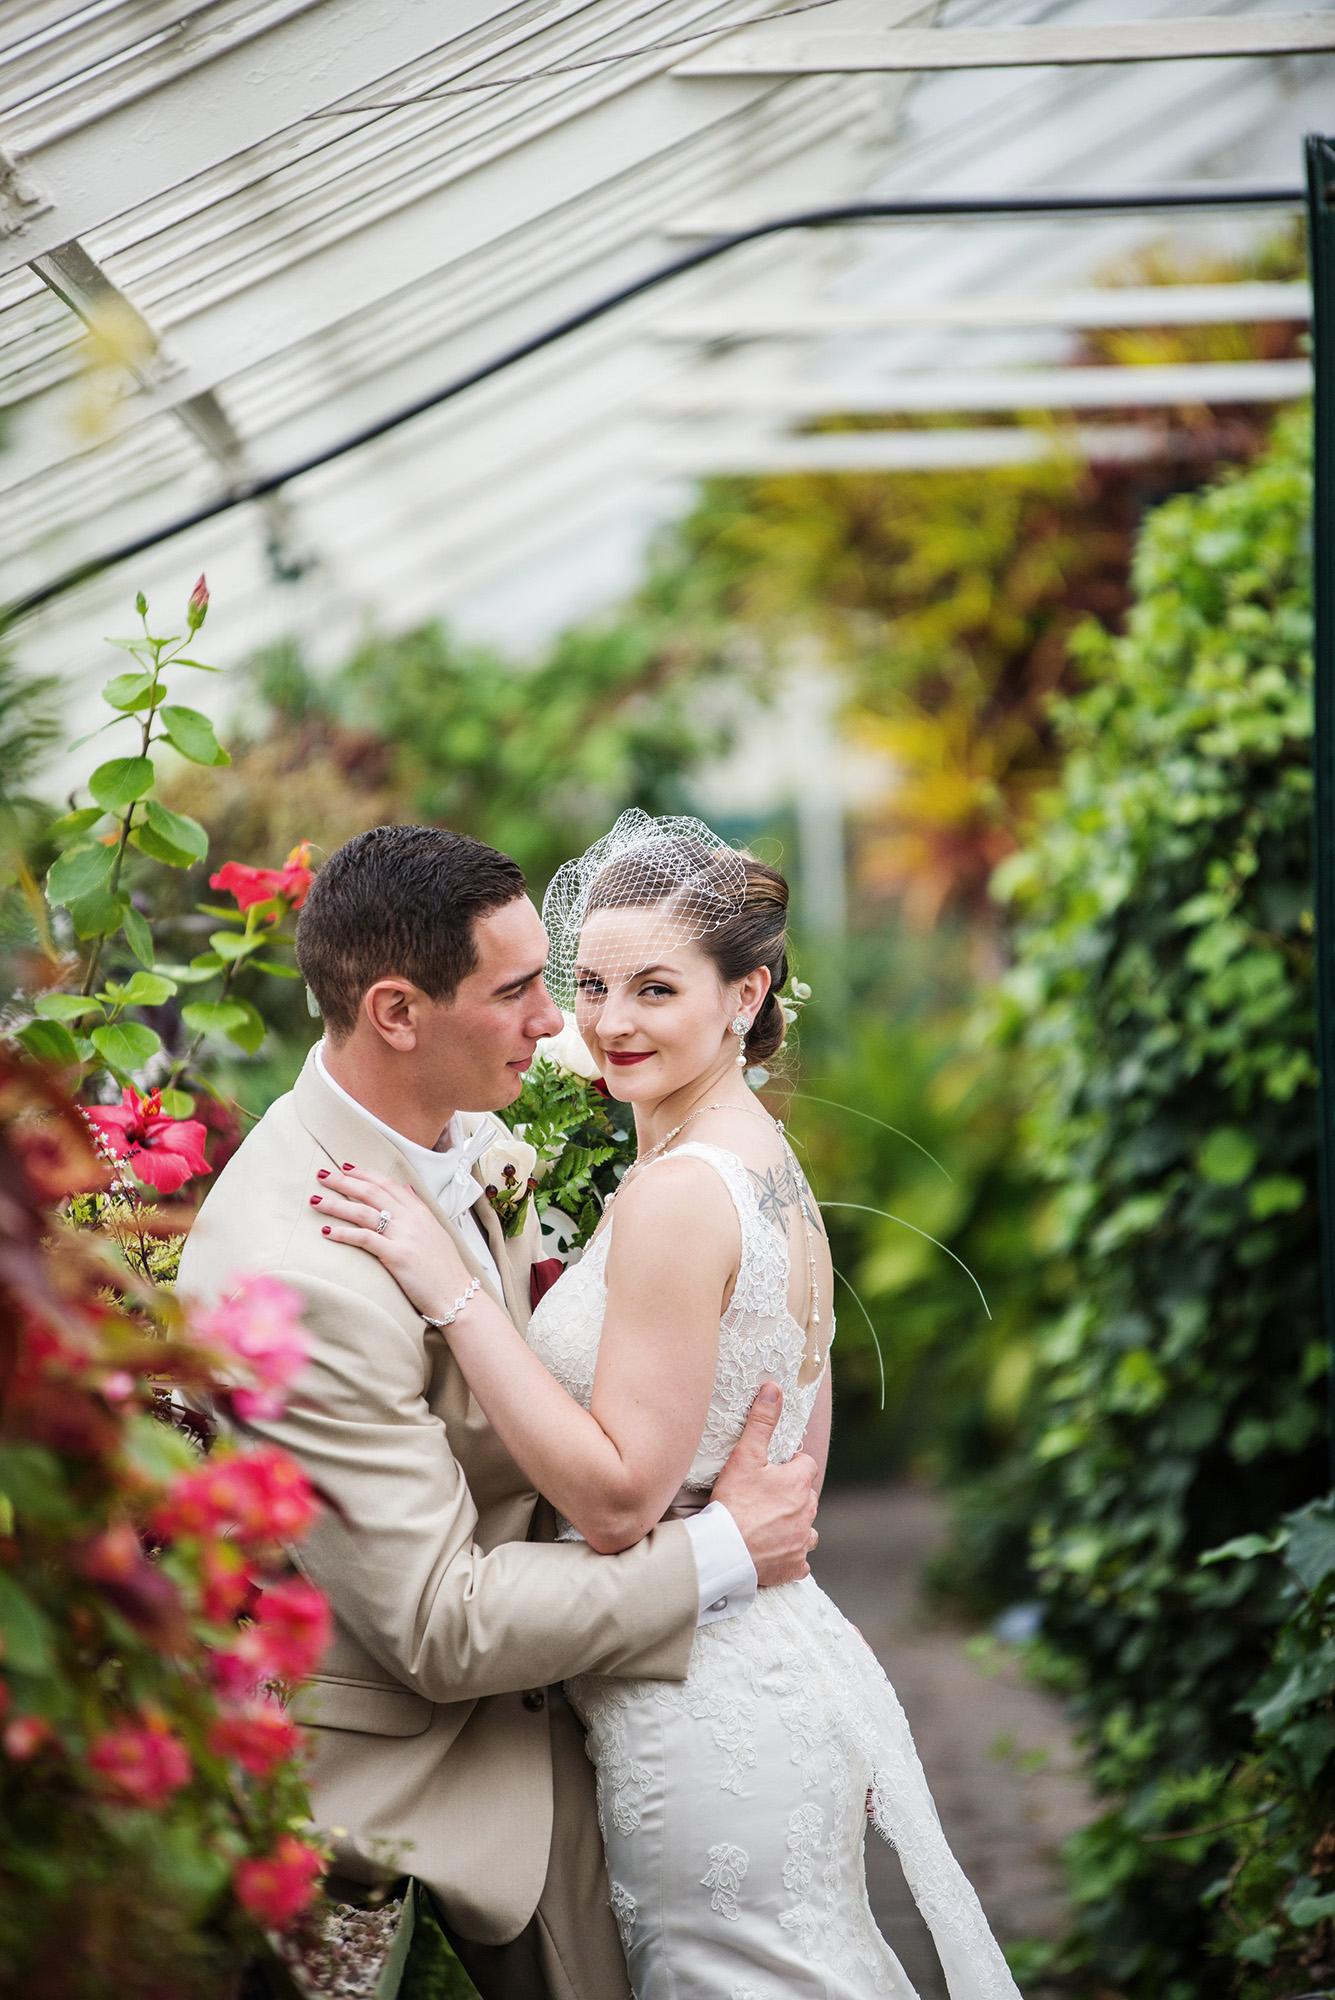 John Kayla Married-John Kayla-0120.jpg